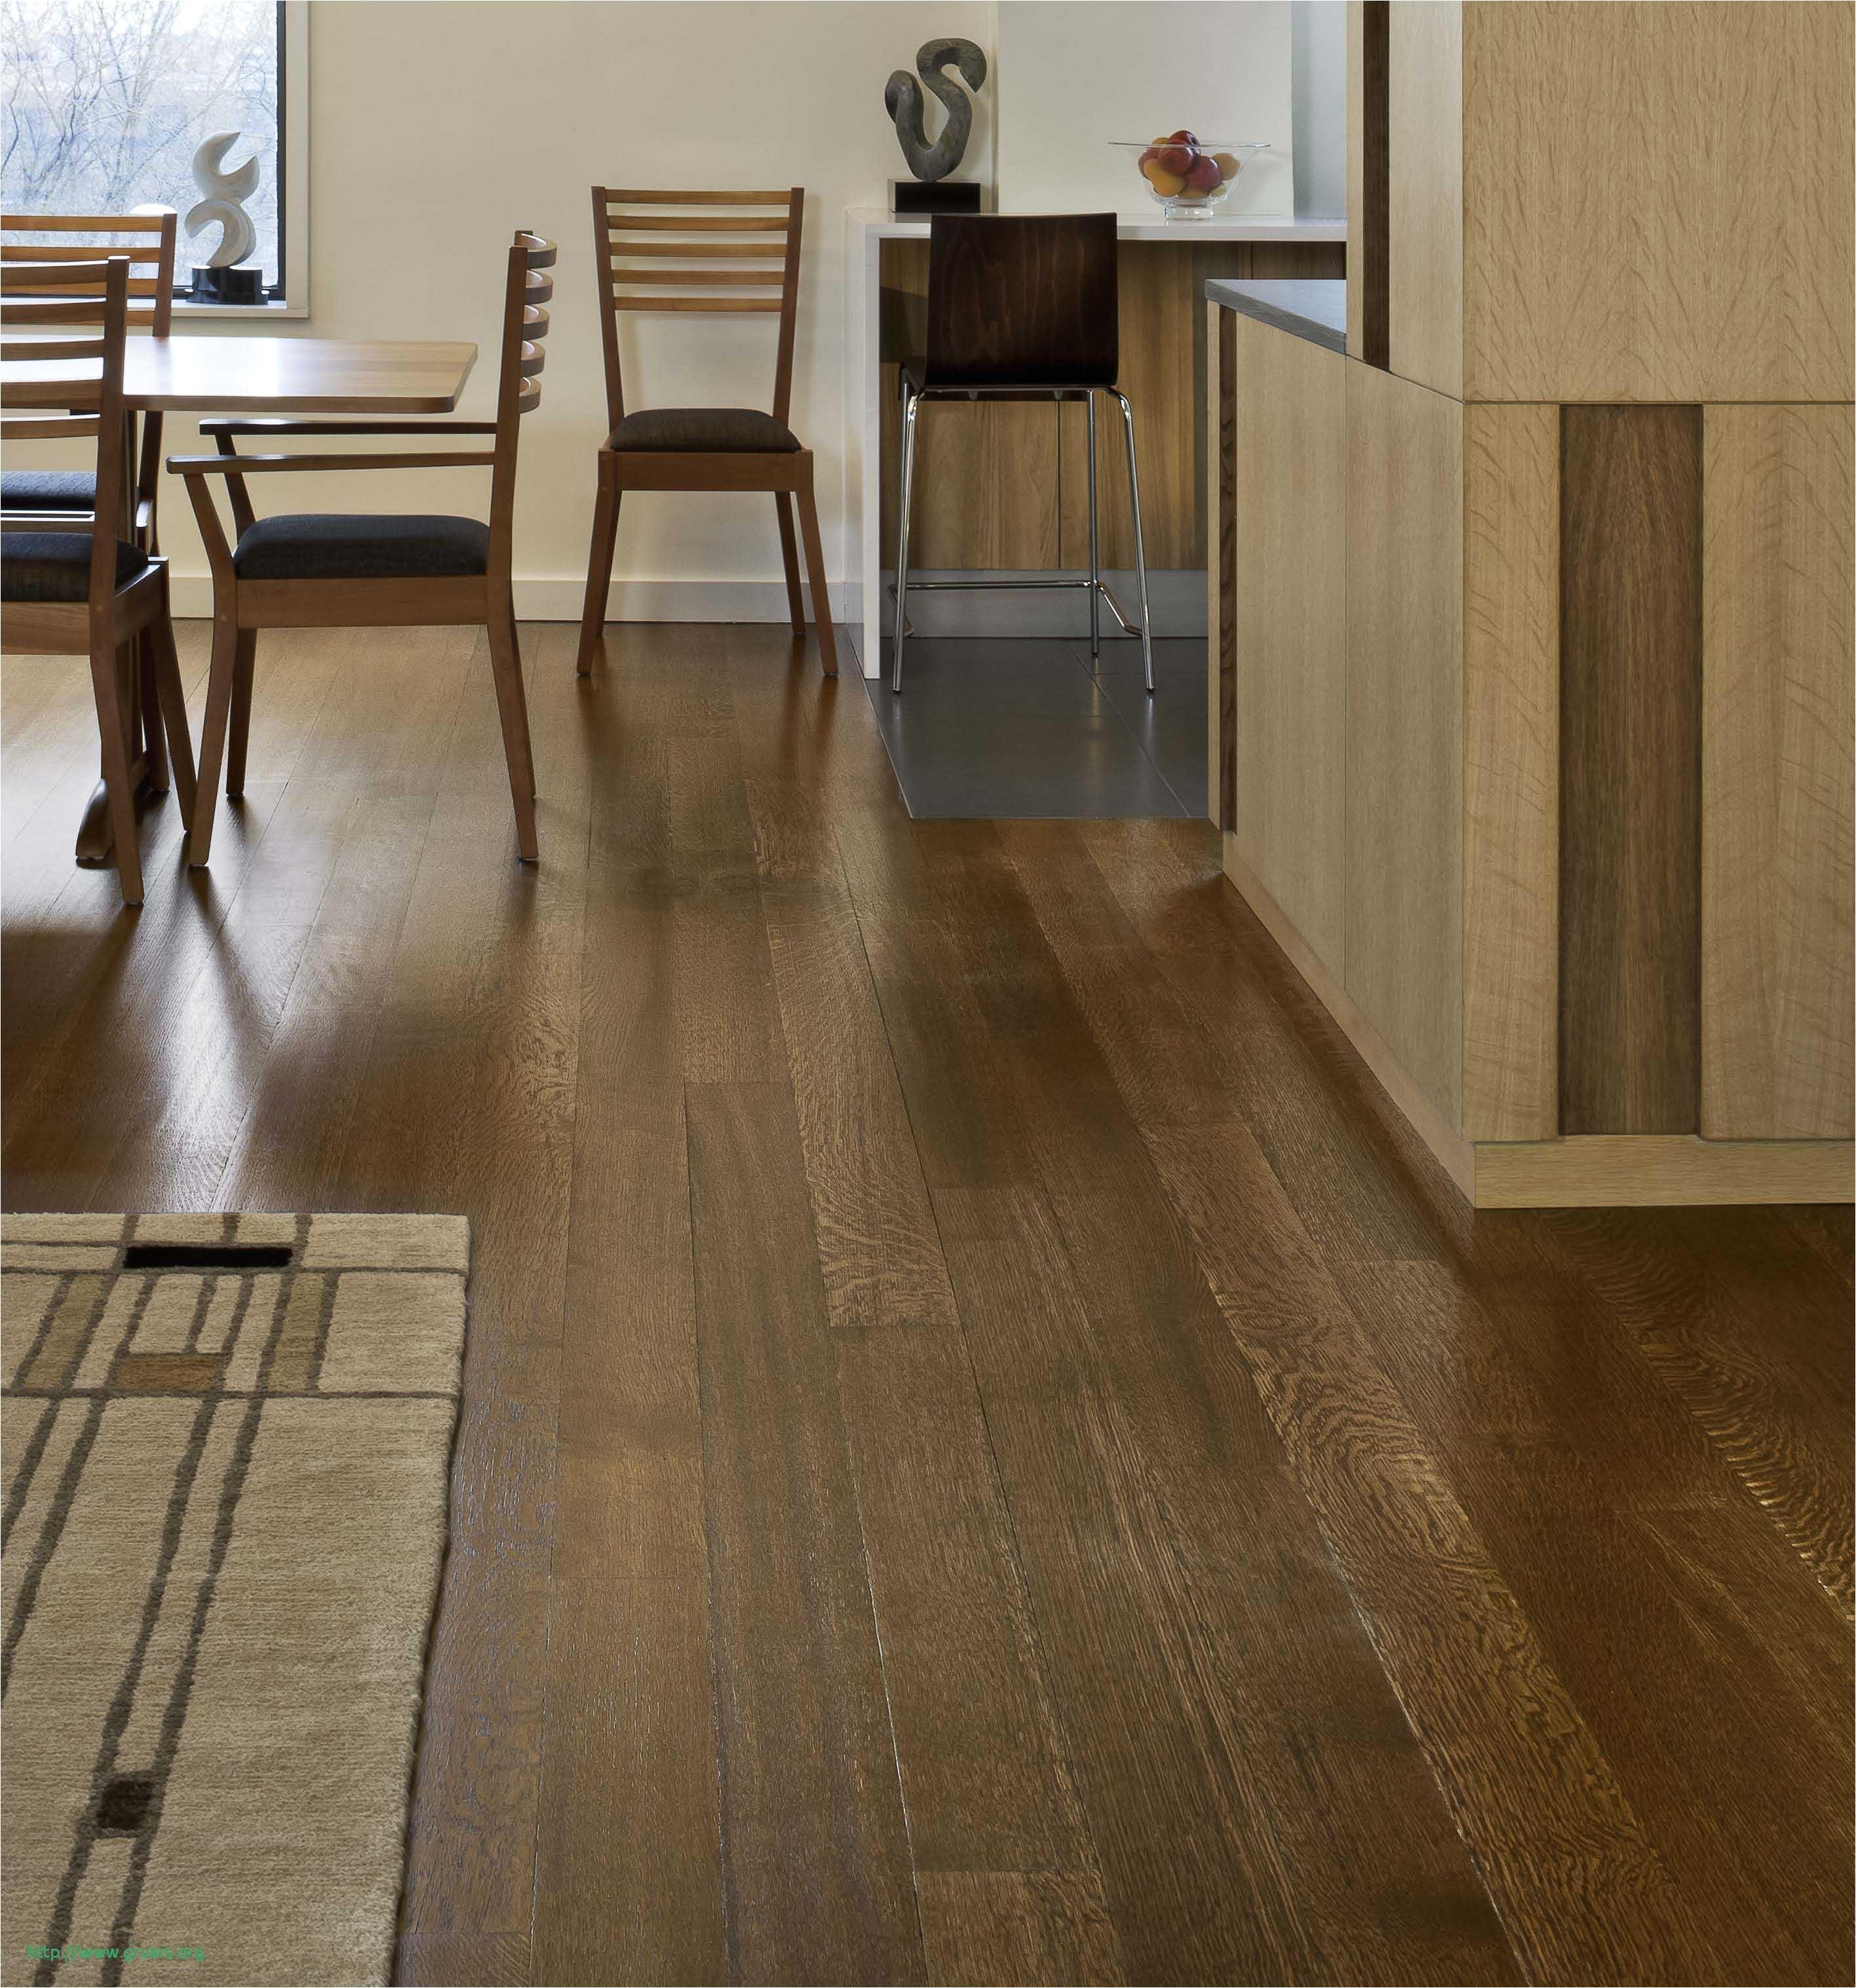 Hardwood Flooring Nashville Tn 24 A Legant Buy Floors Direct Nashville Ideas Blog